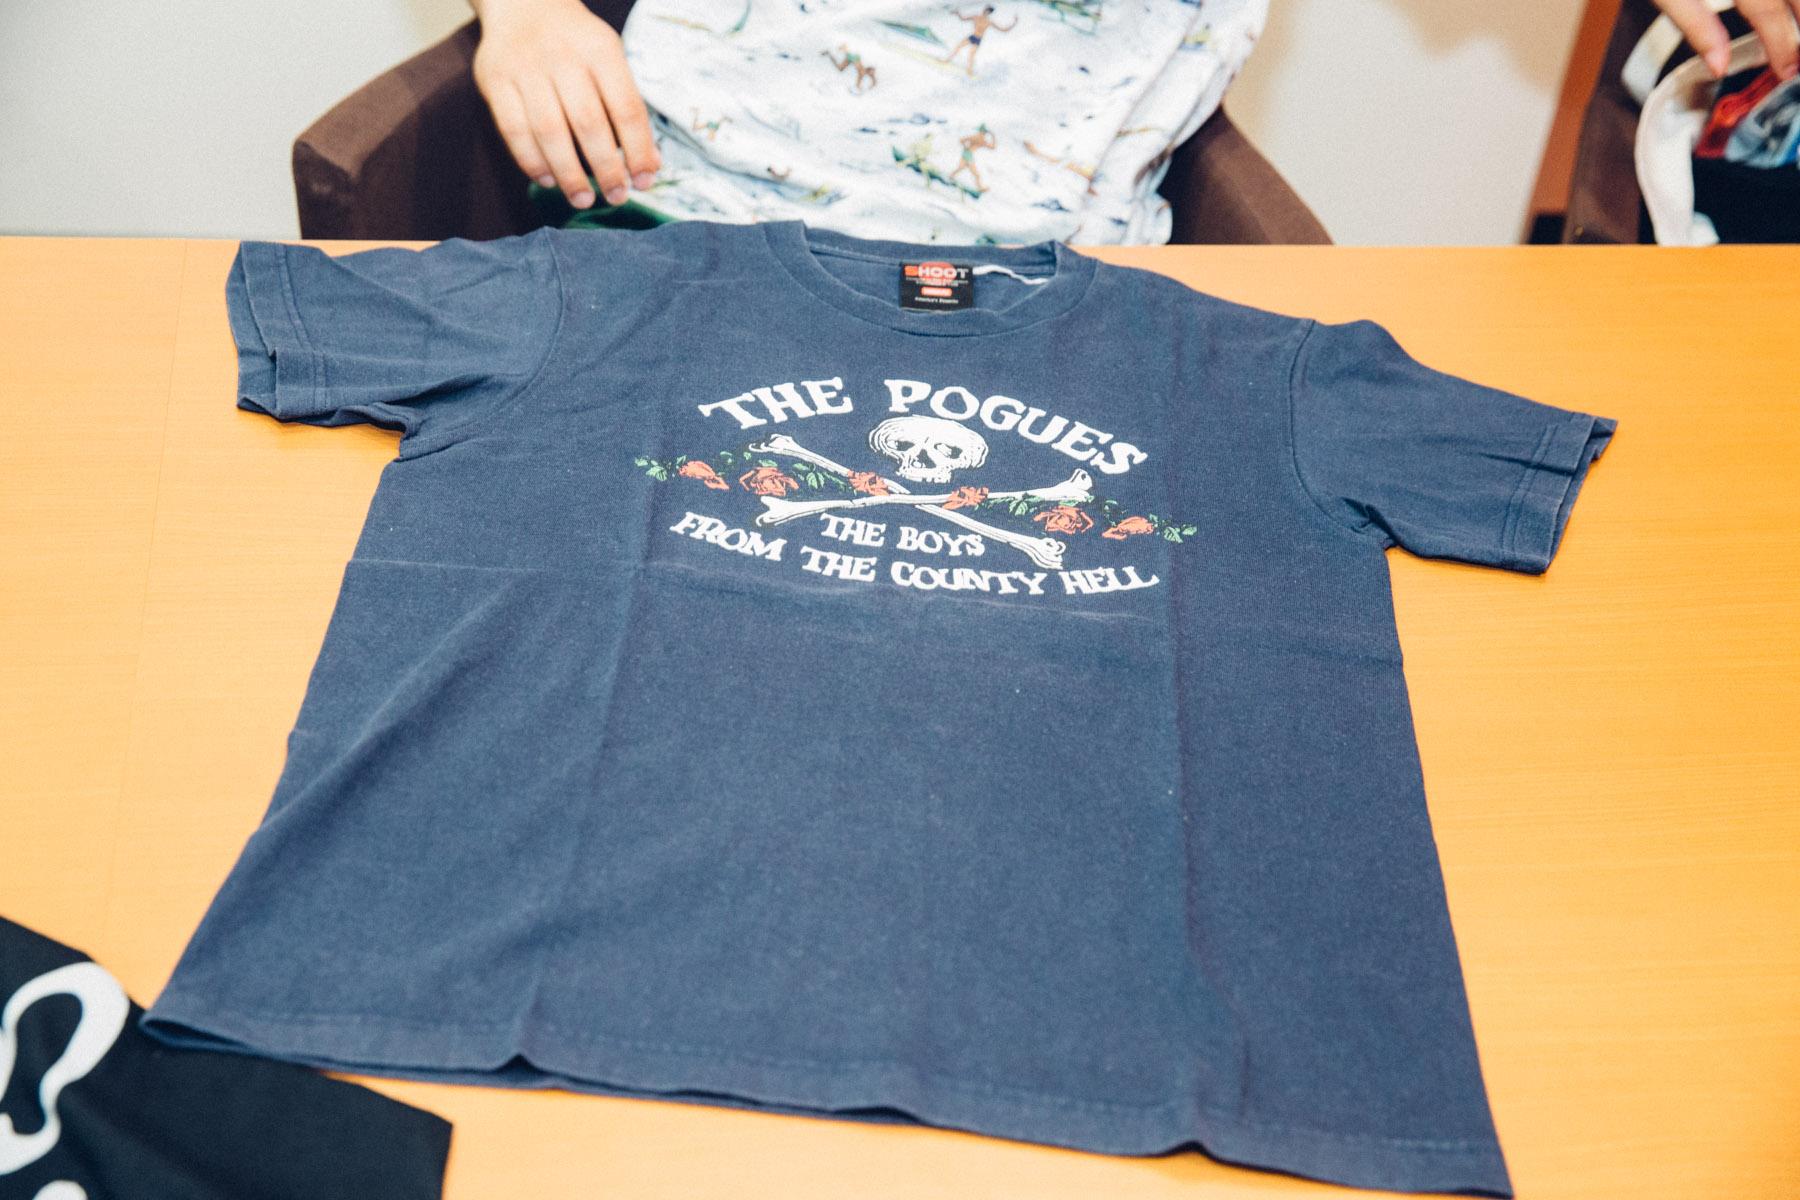 6_MG_2566 音楽好き芸人ハライチ、今年はふたりでフジロックへ行こう!?お気に入りのロックTシャツ対決も!